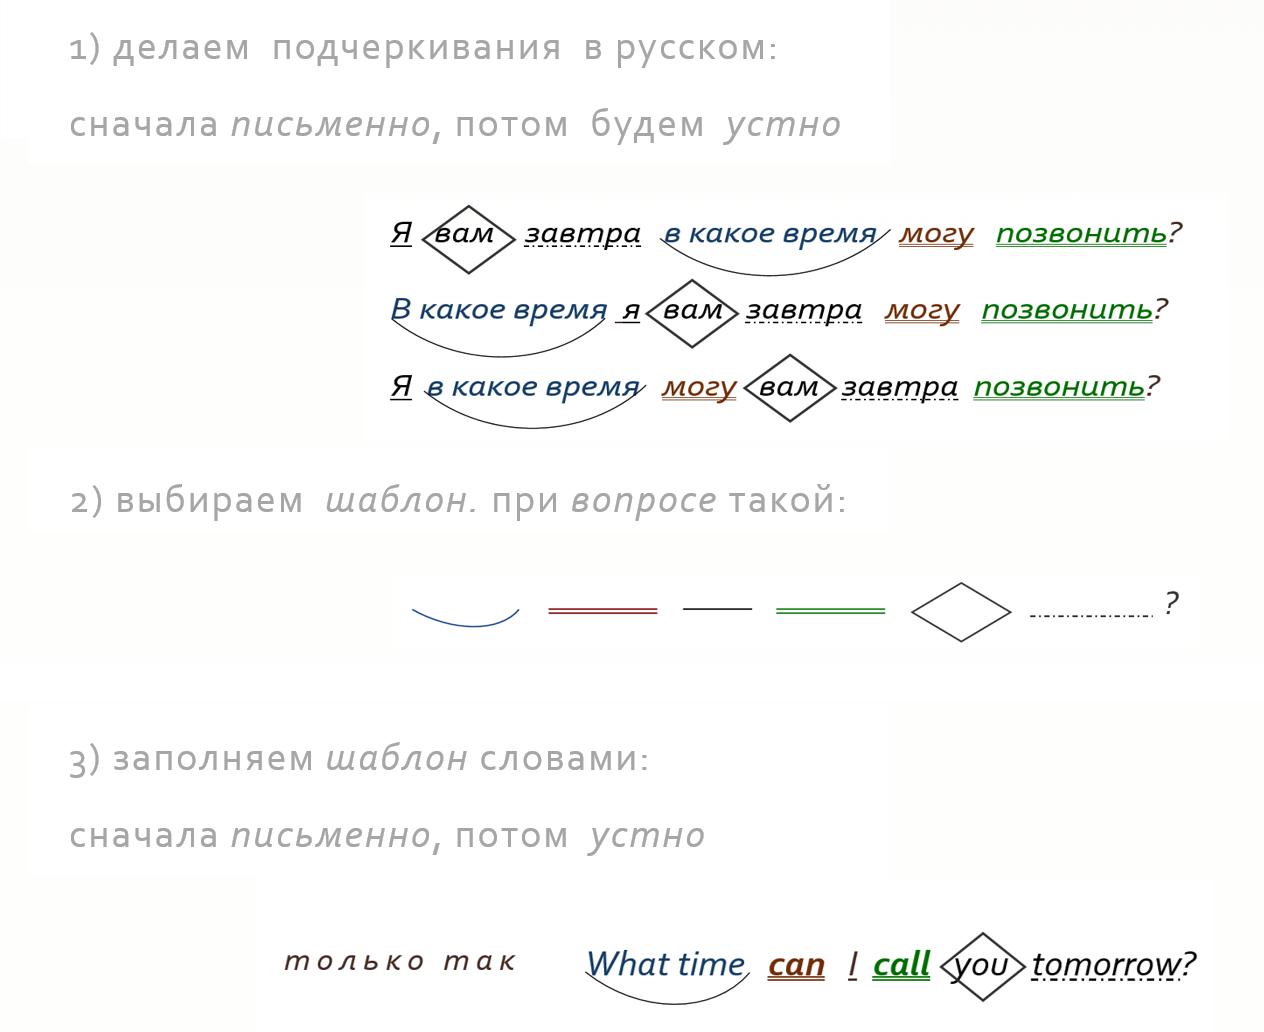 английский по скайпу в шаблонах